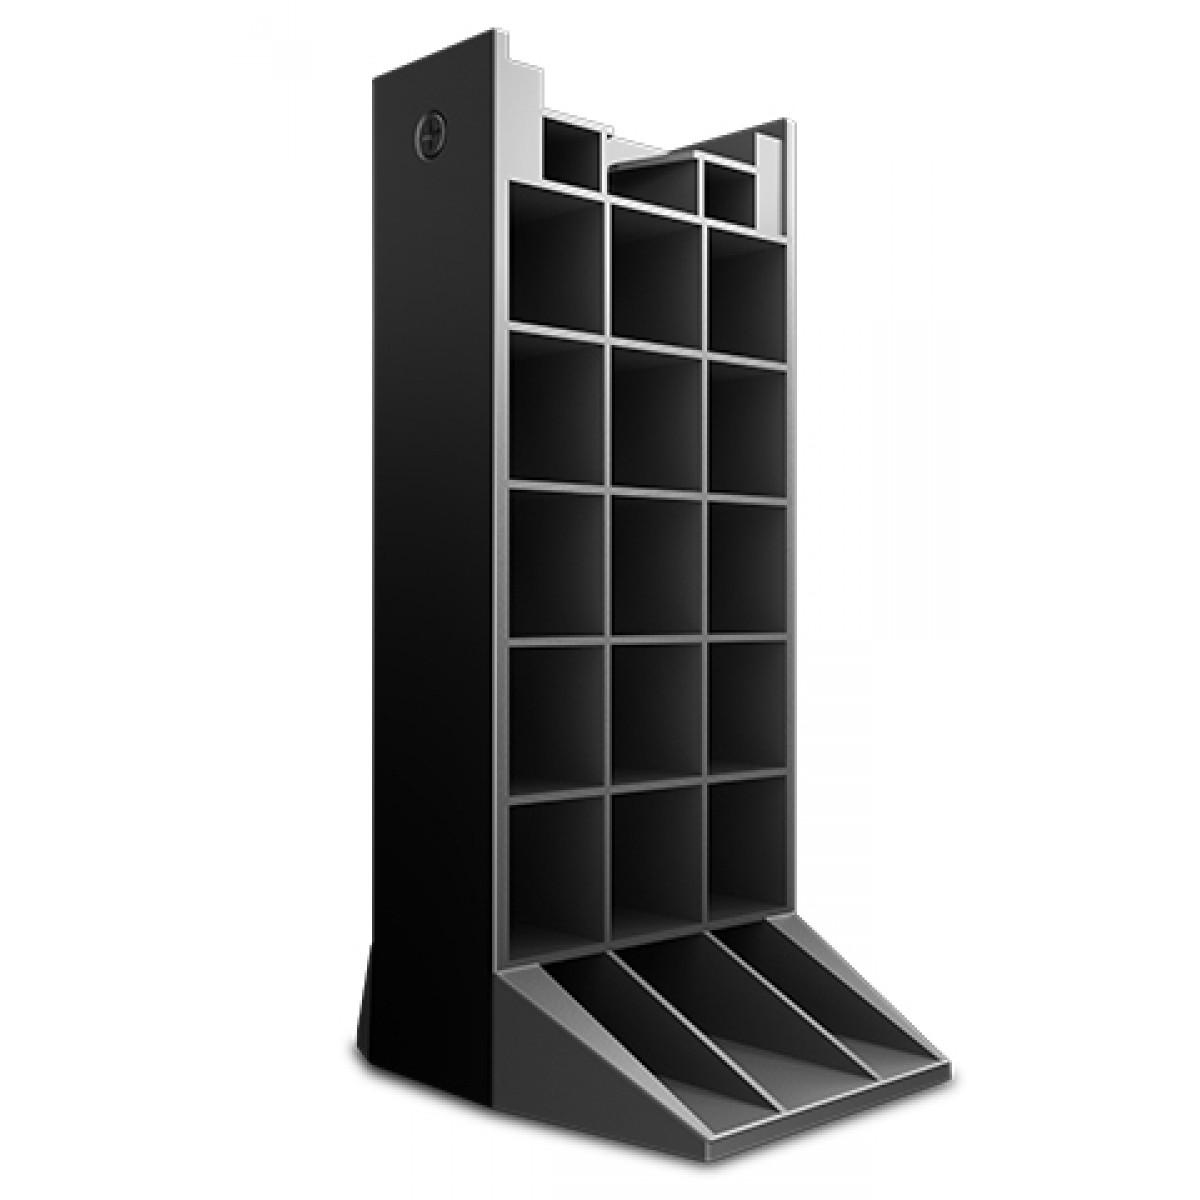 Stand para GH-01, Deepcool, DP-GH01-STAND, Black, DP-GH01-STAND